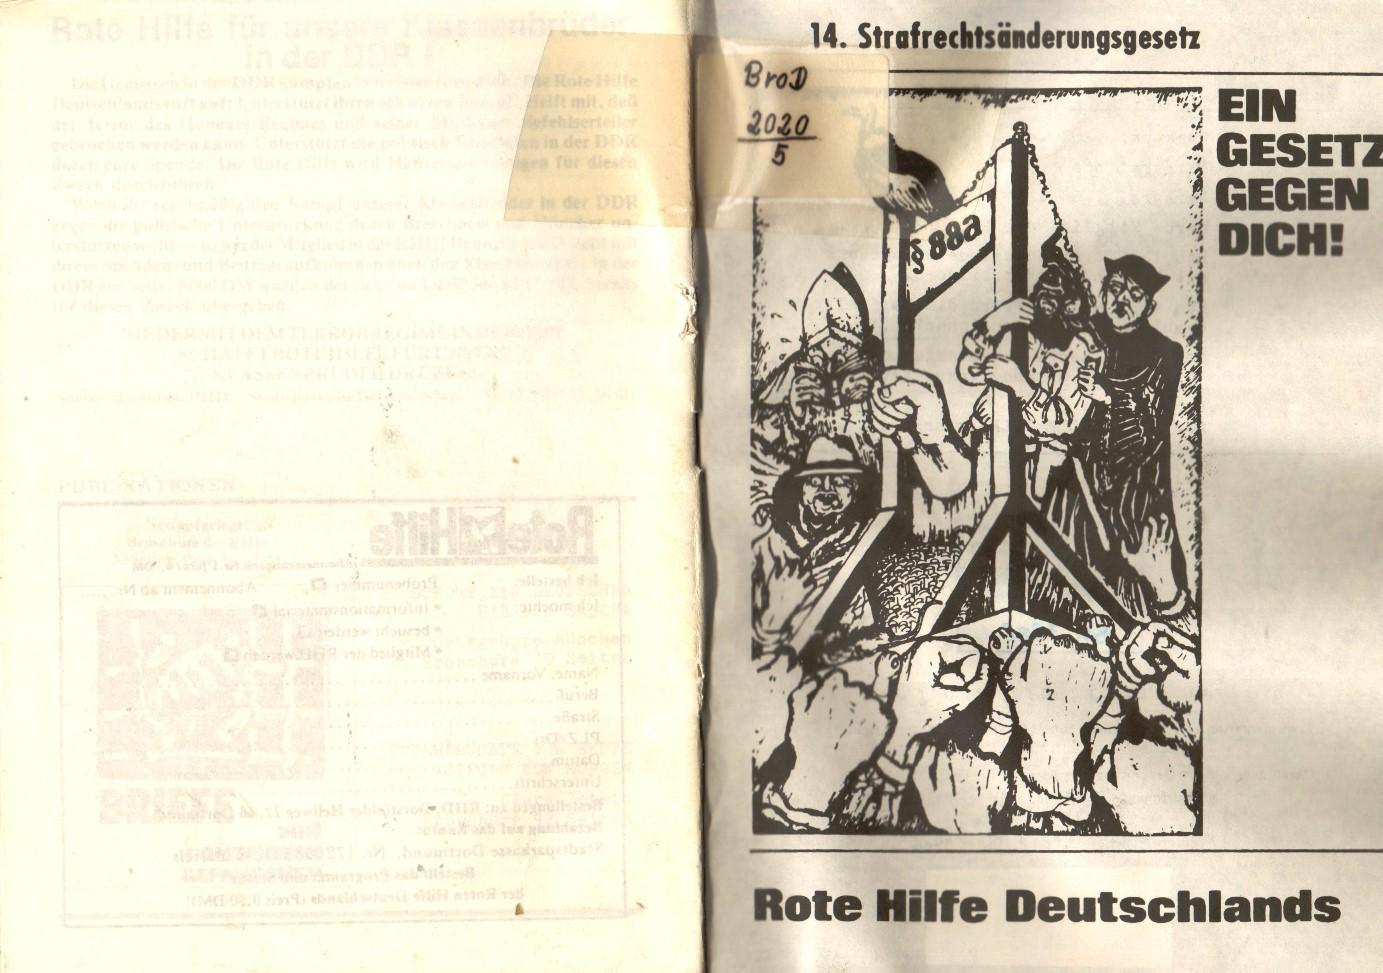 RHD_1976_Doku_Strafrechtsaenderungsgesetz_01